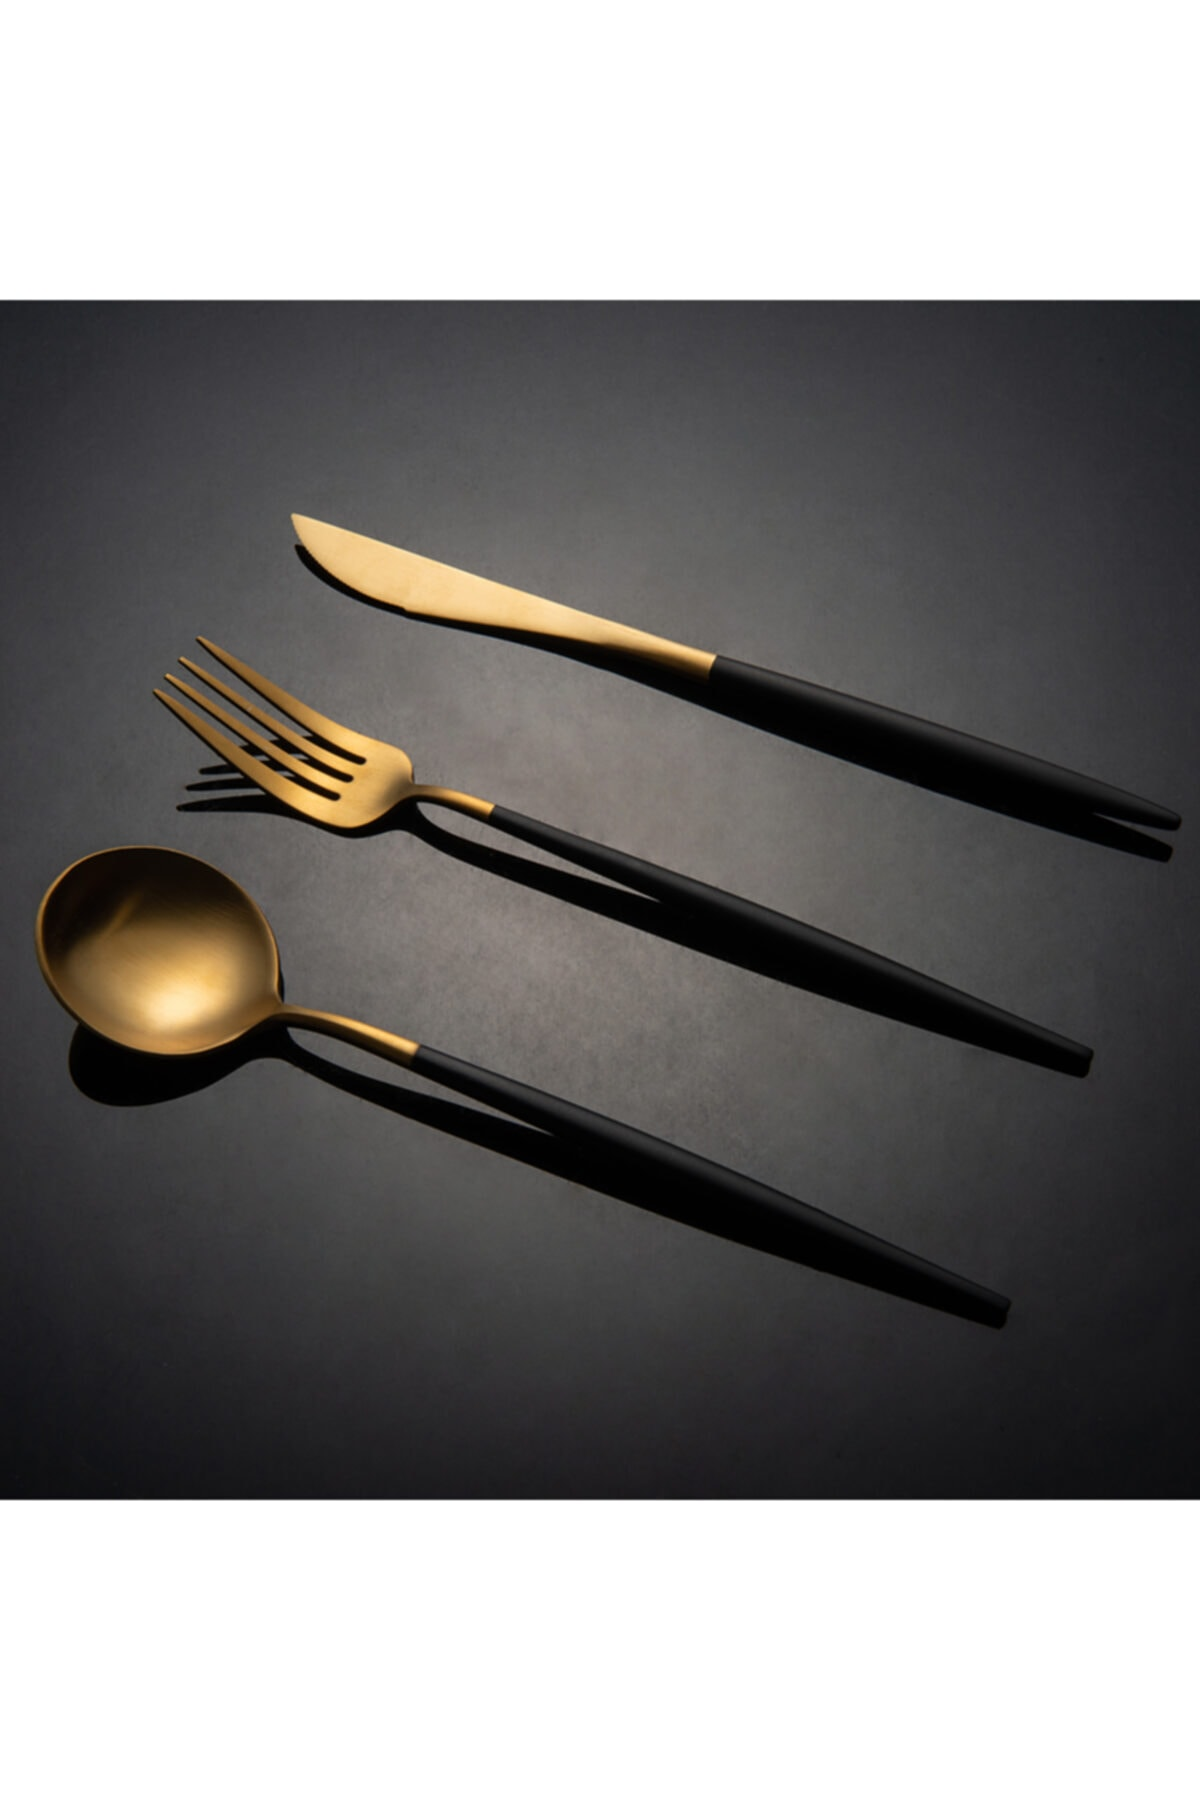 ACAR Mat Altın Siyah 30 Parça Çatal Bıçak Takımı 1